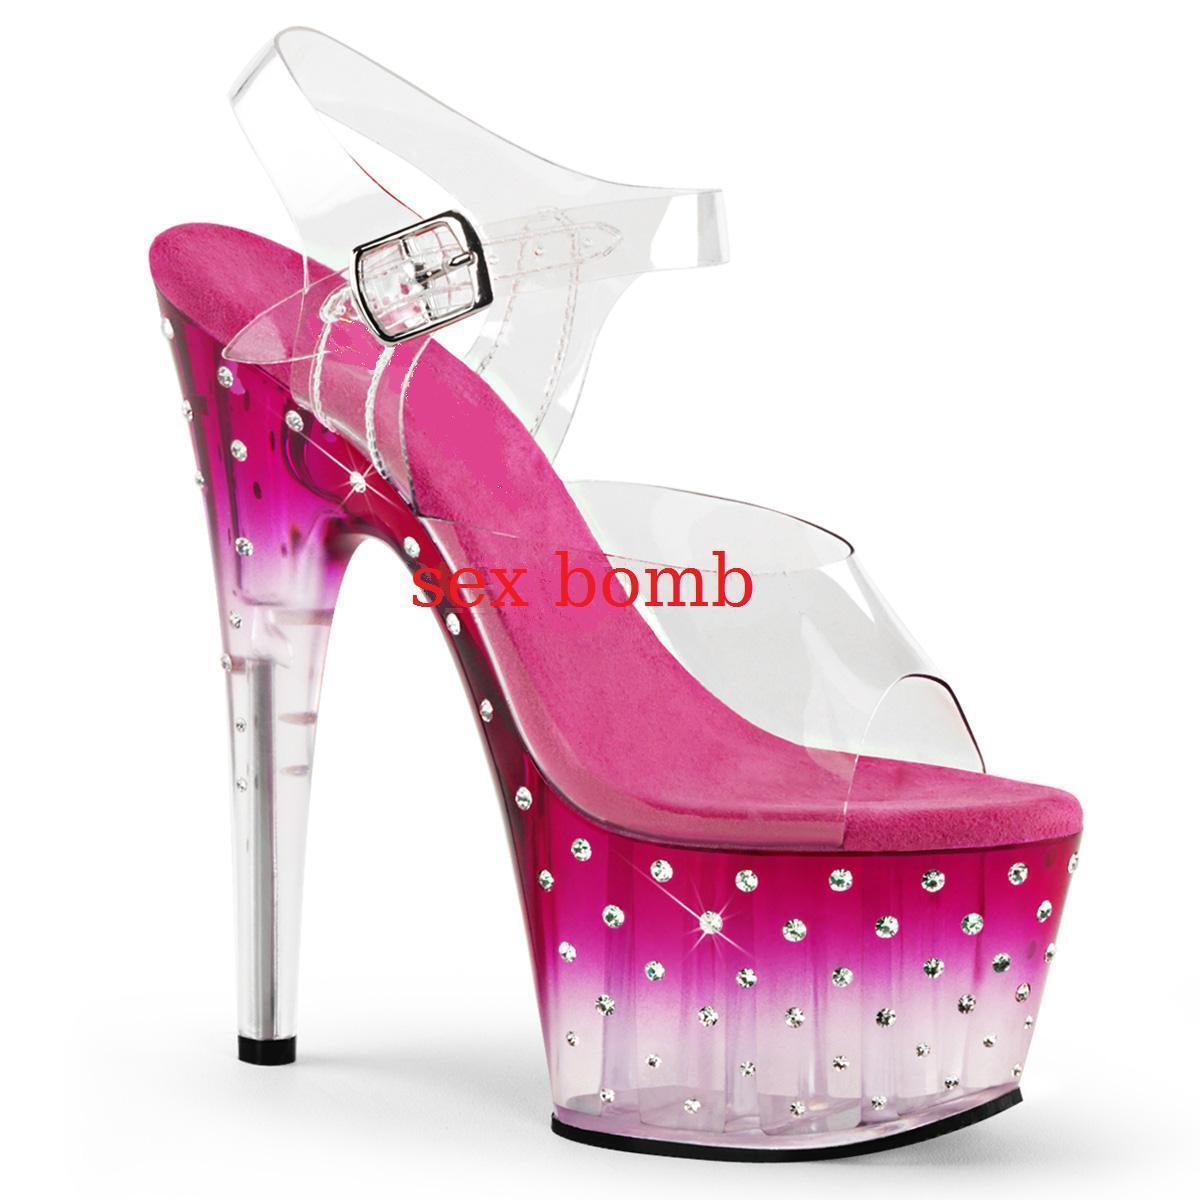 Sexy SANDALI STRASS STRASS STRASS tacco 18 plateau dal 35 al 40 TRASPARENTE/ROSA glamour CLUB 4d4c21